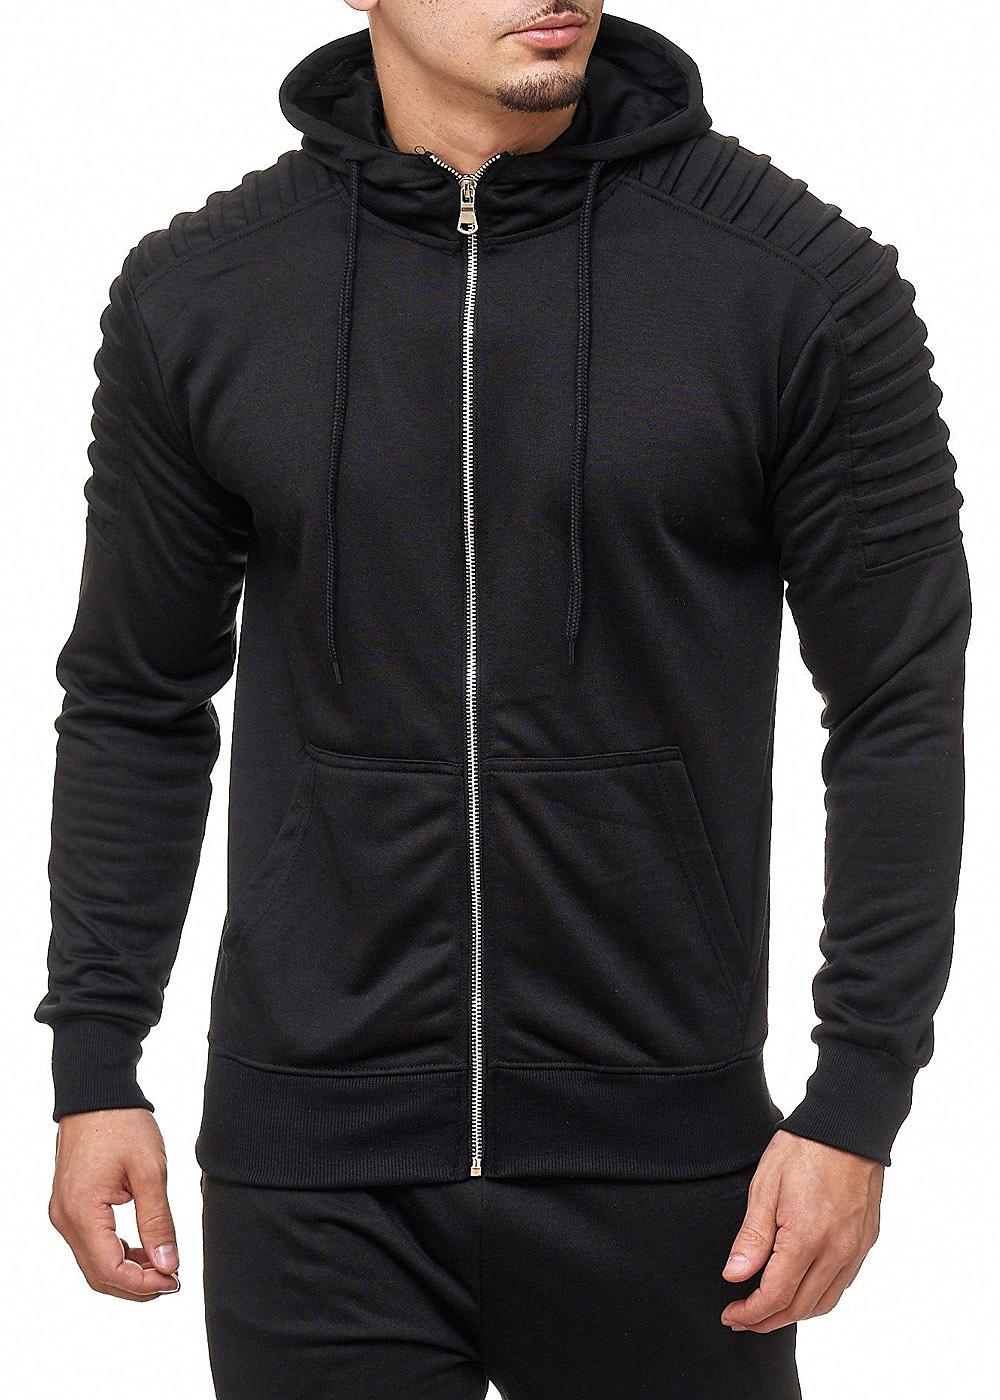 seventyseven lifestyle herren zip hoodie 2 taschen schwarz. Black Bedroom Furniture Sets. Home Design Ideas